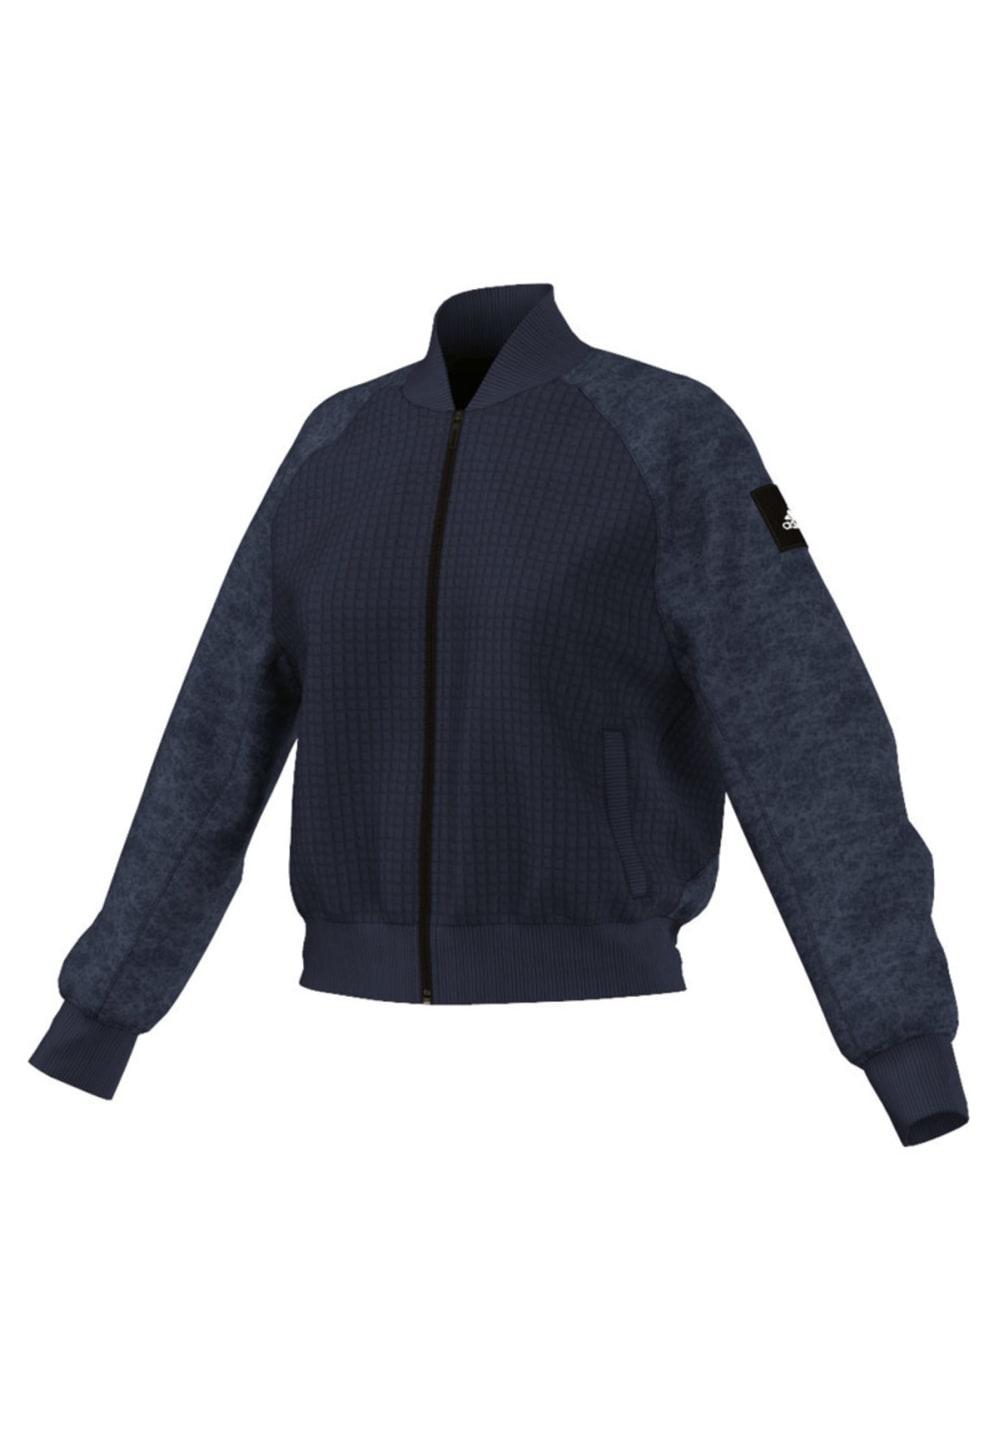 Jacket Sudaderas Bomber Moonwash Para Mujer Negro Adidas I7gfyYbv6